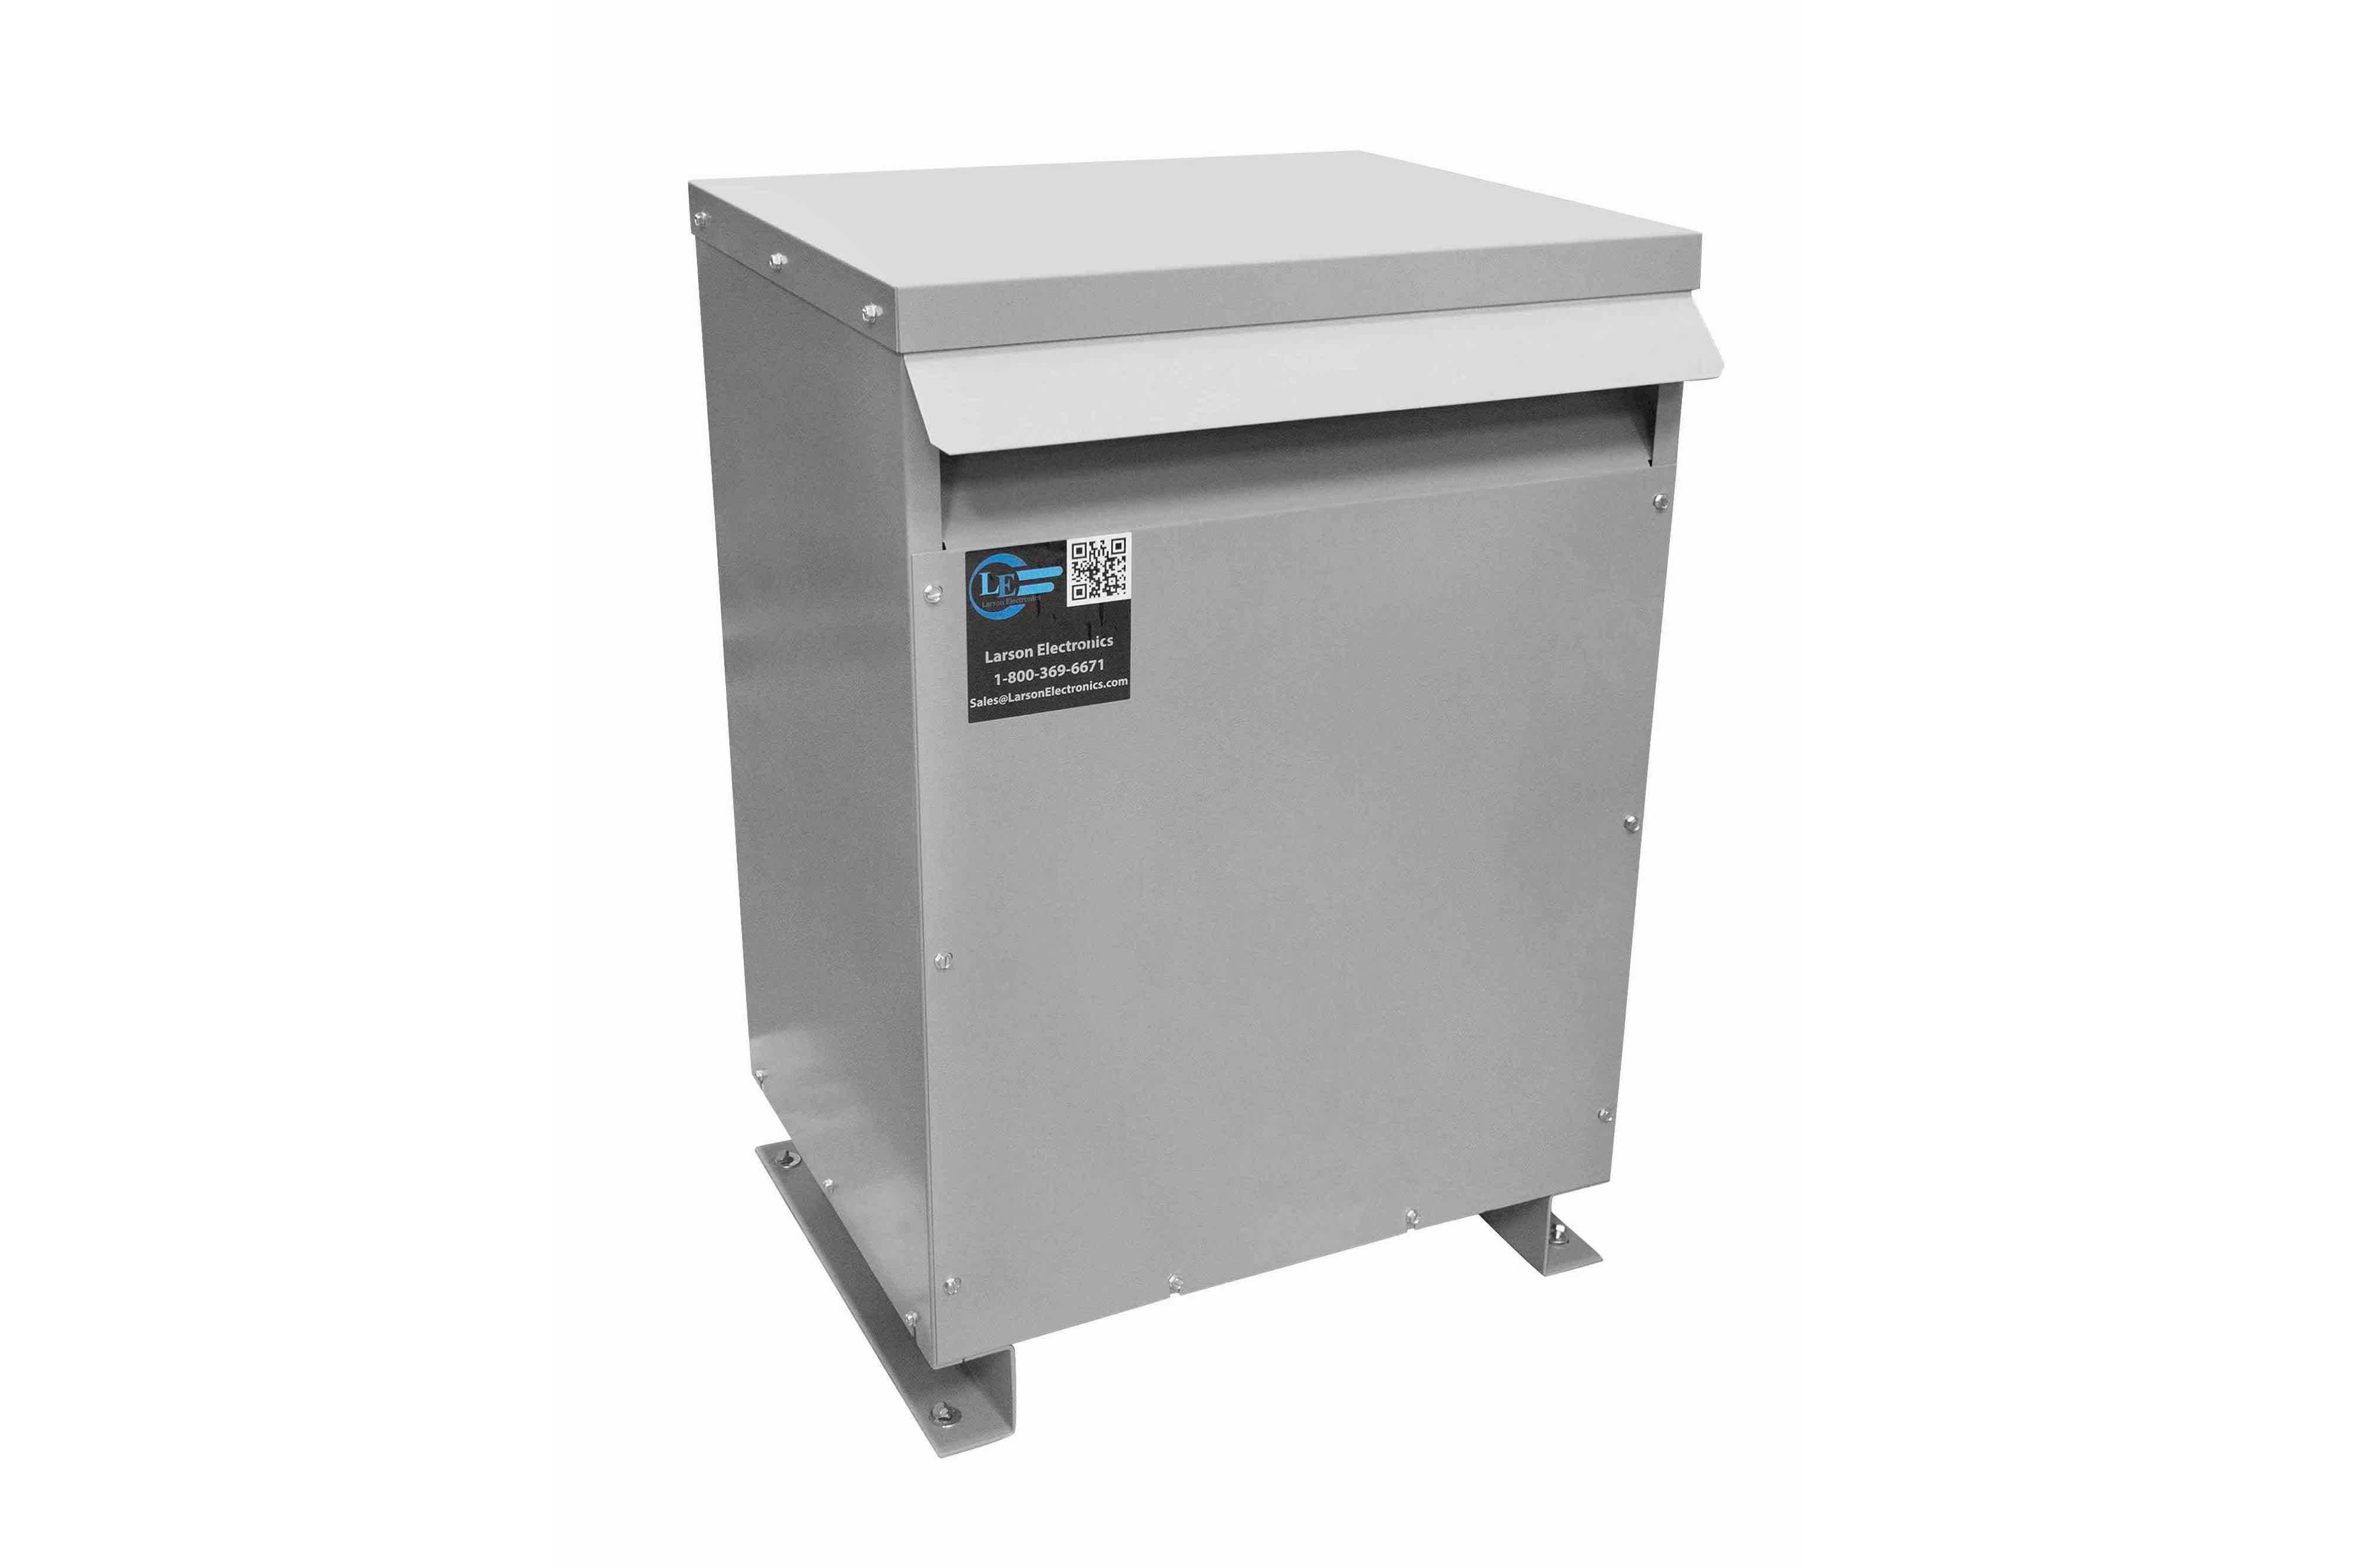 52.5 kVA 3PH Isolation Transformer, 208V Wye Primary, 380V Delta Secondary, N3R, Ventilated, 60 Hz